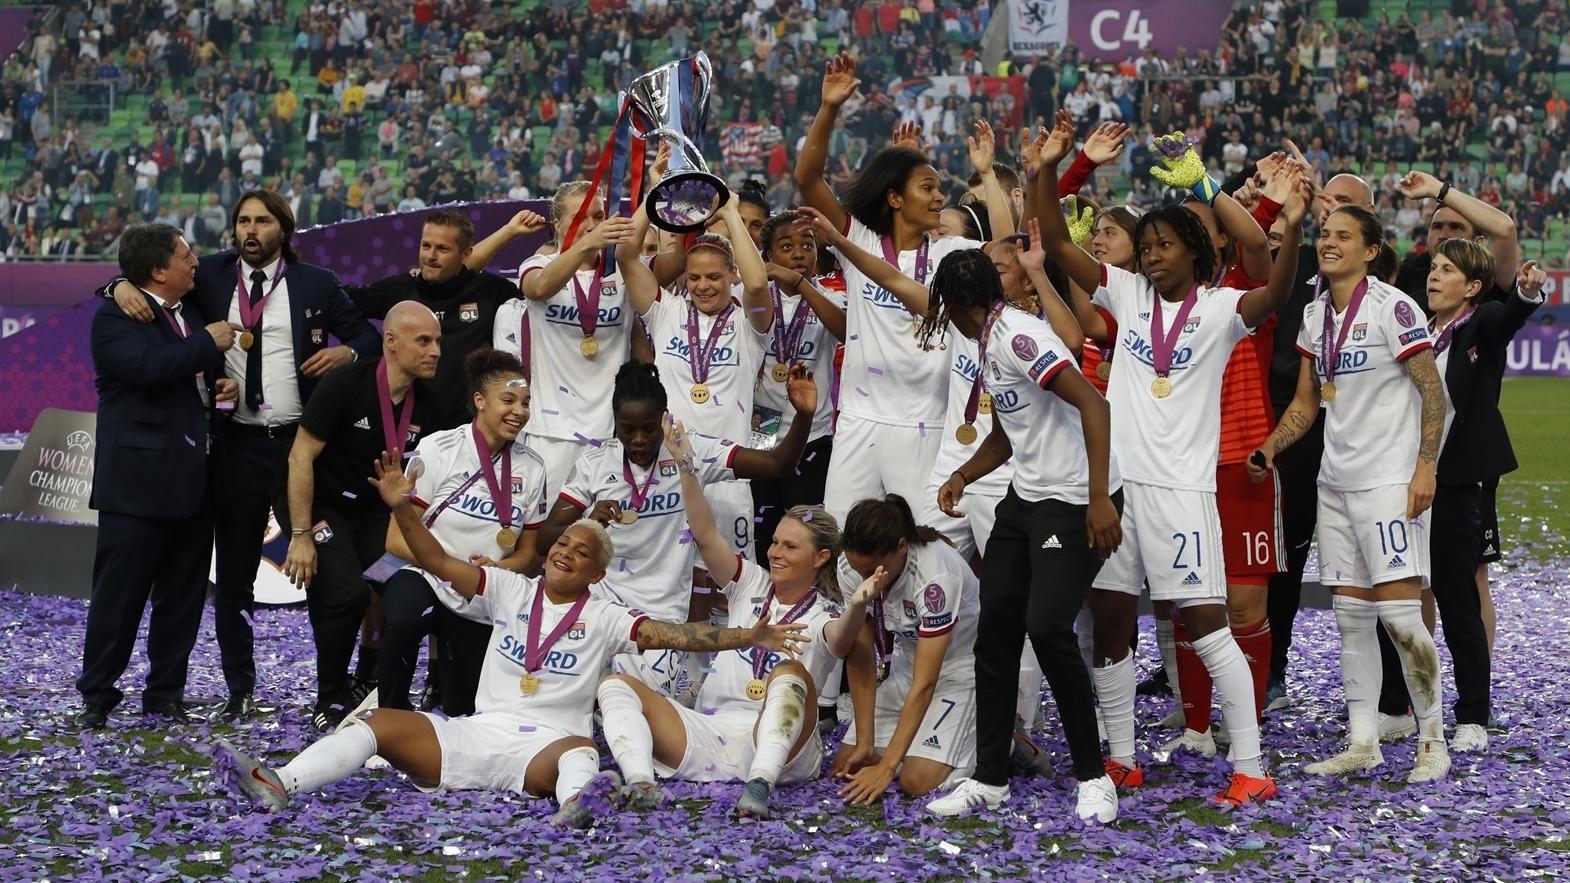 uefa women's champions league records